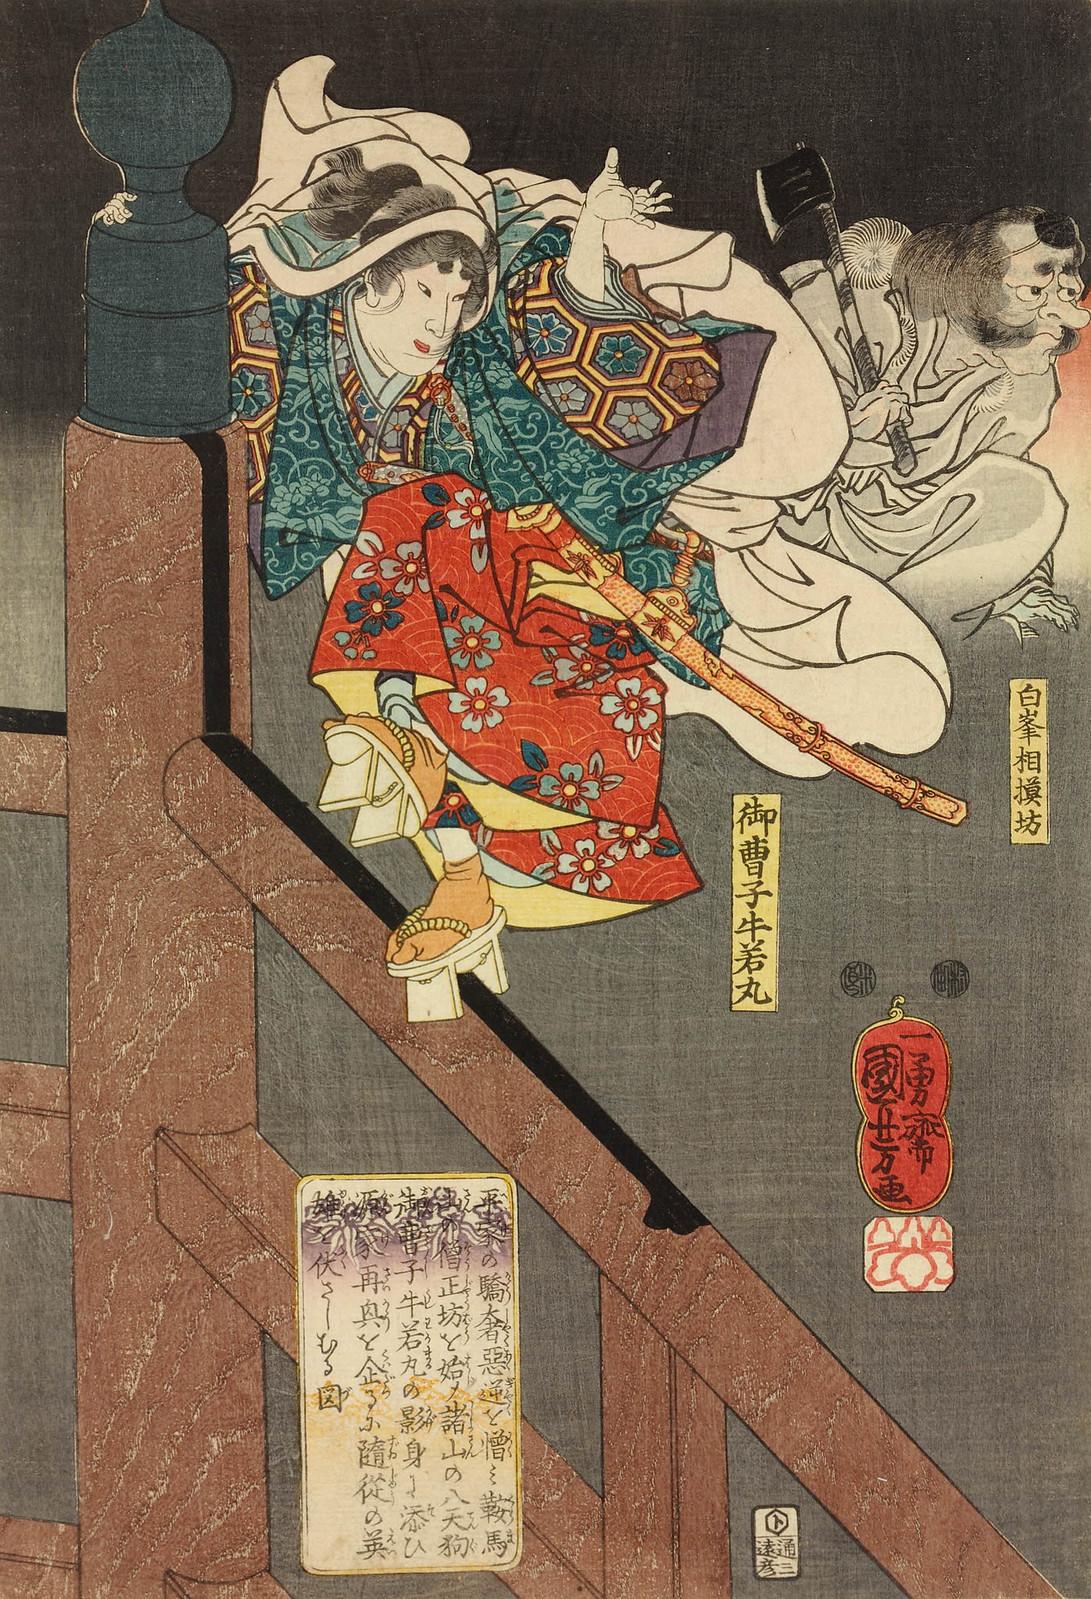 Utagawa Kuniyoshi - Ushiwakamaru (Yoshitsune) Fighting Benkei with the Help of the Tengu, 1847-50 (leftpanel)